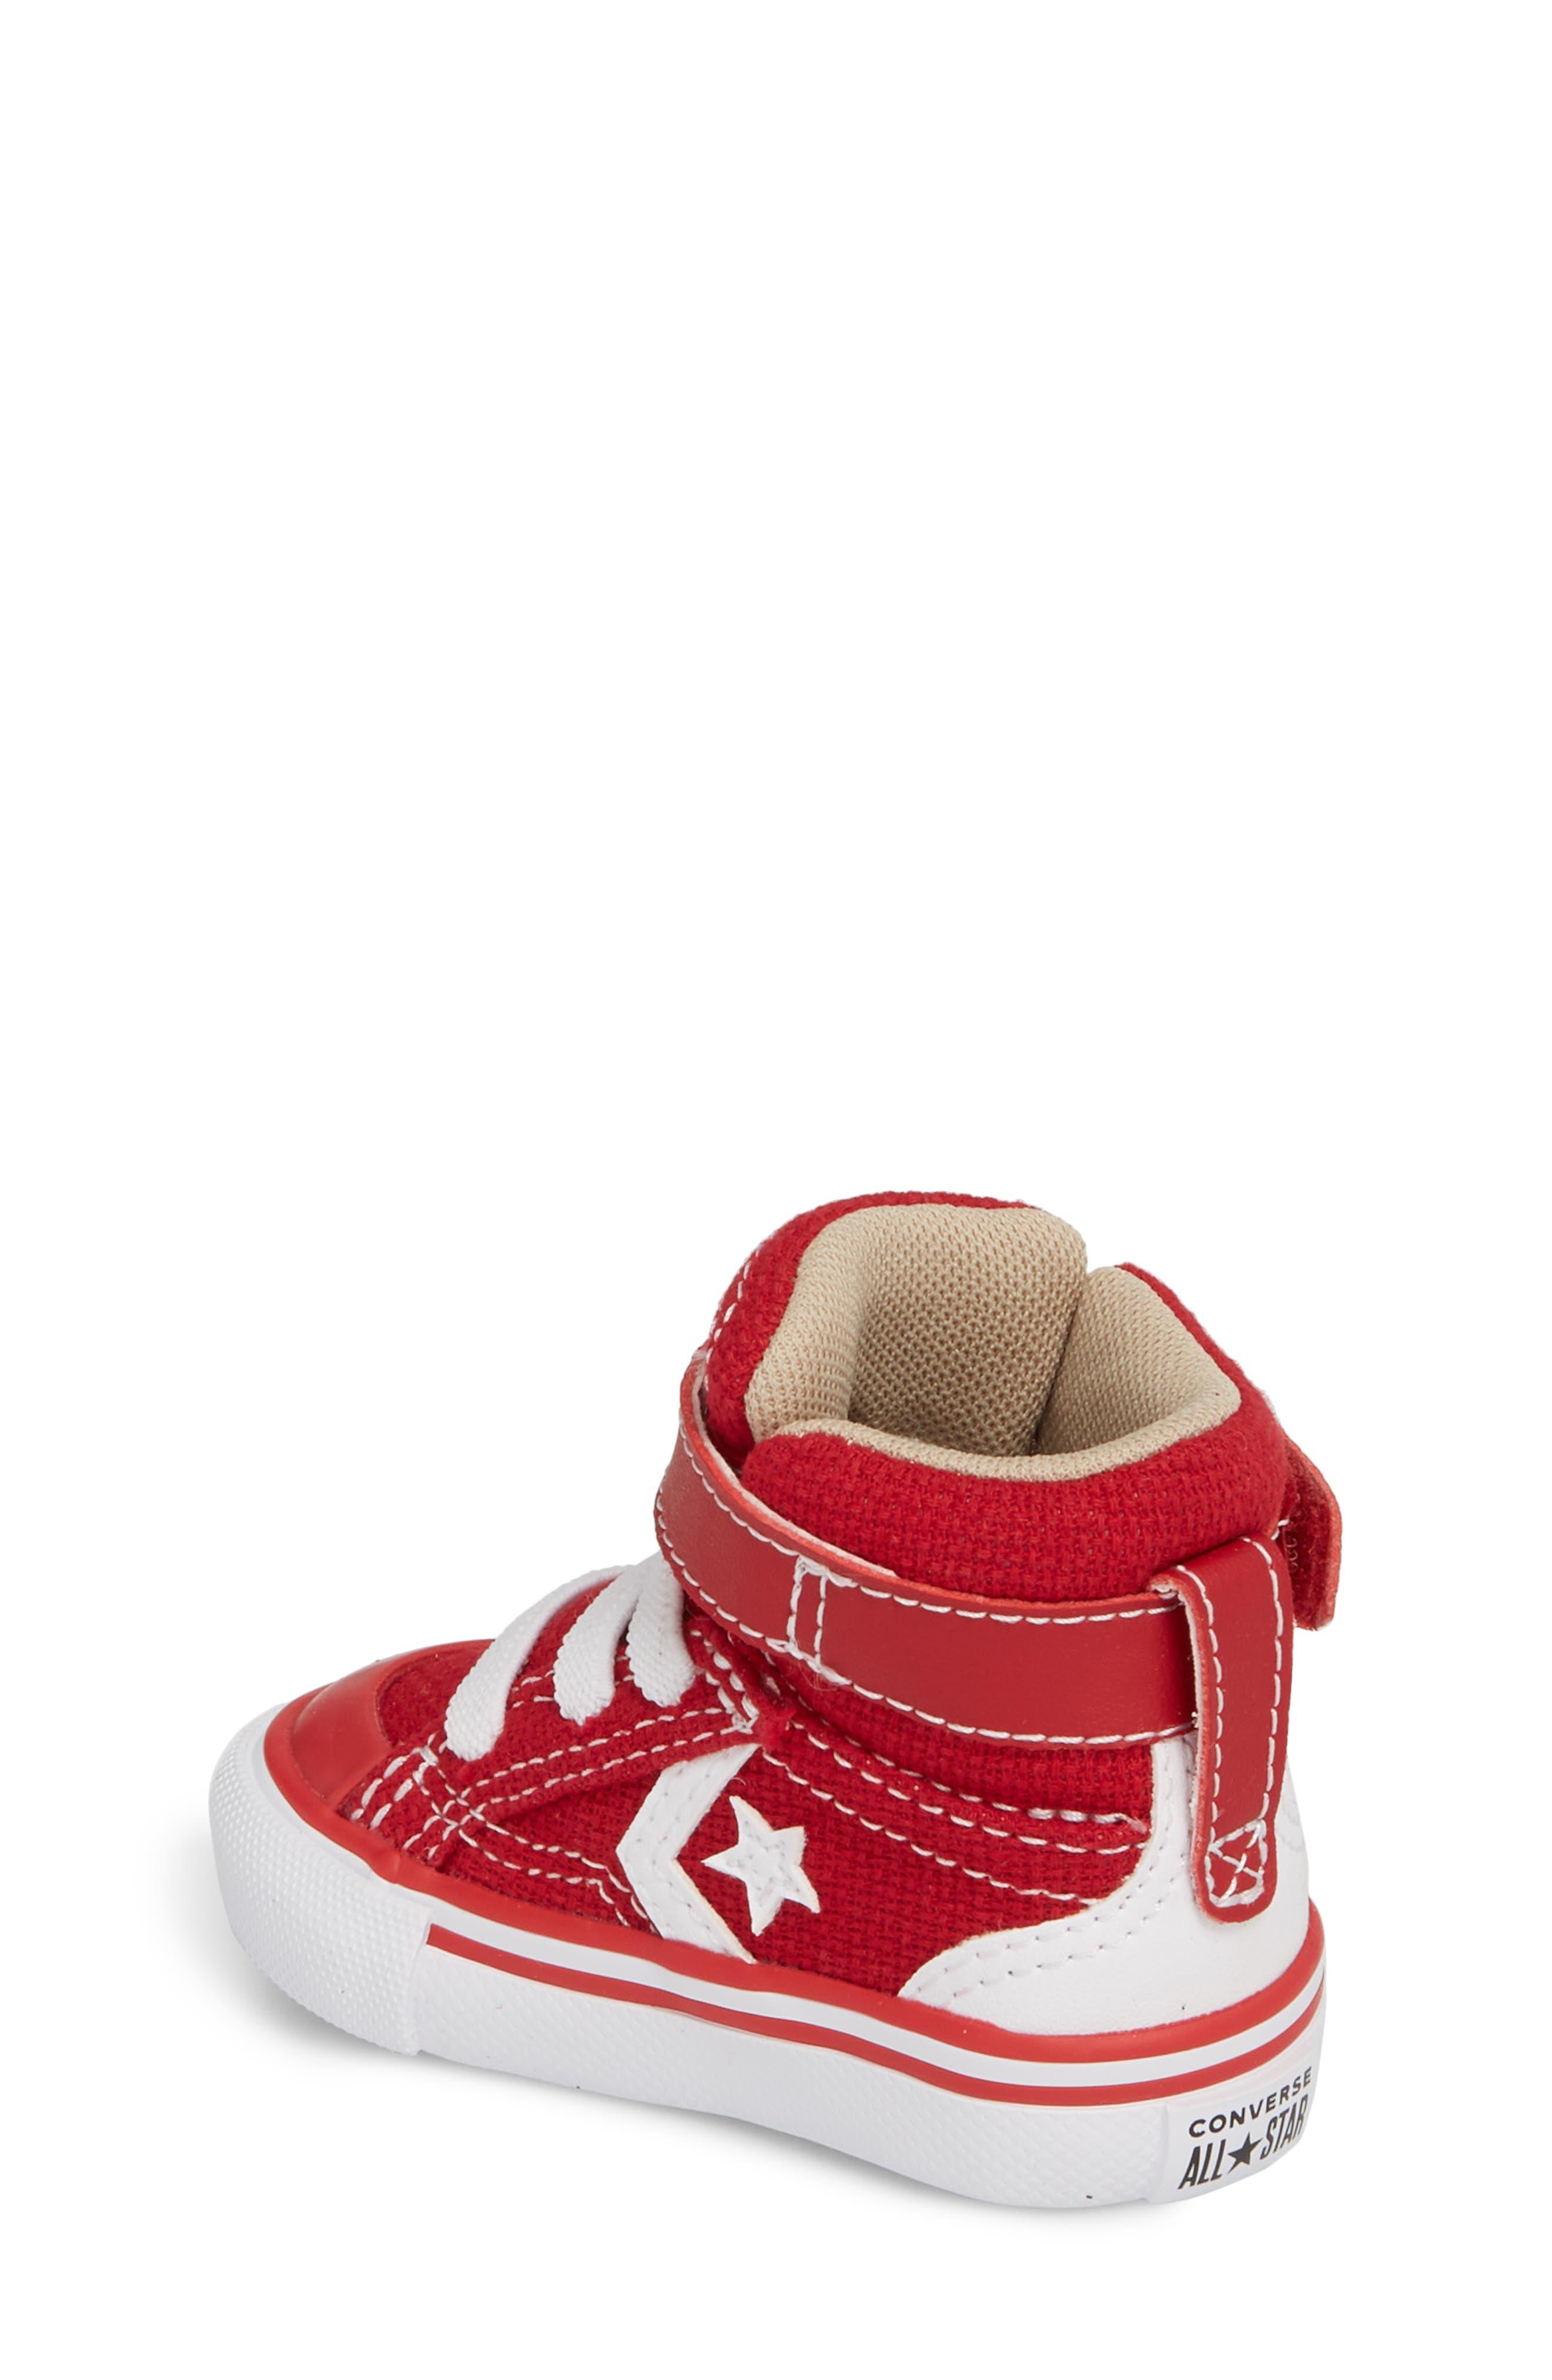 Pro Blaze High Top Sneaker,                             Alternate thumbnail 2, color,                             Gym Red